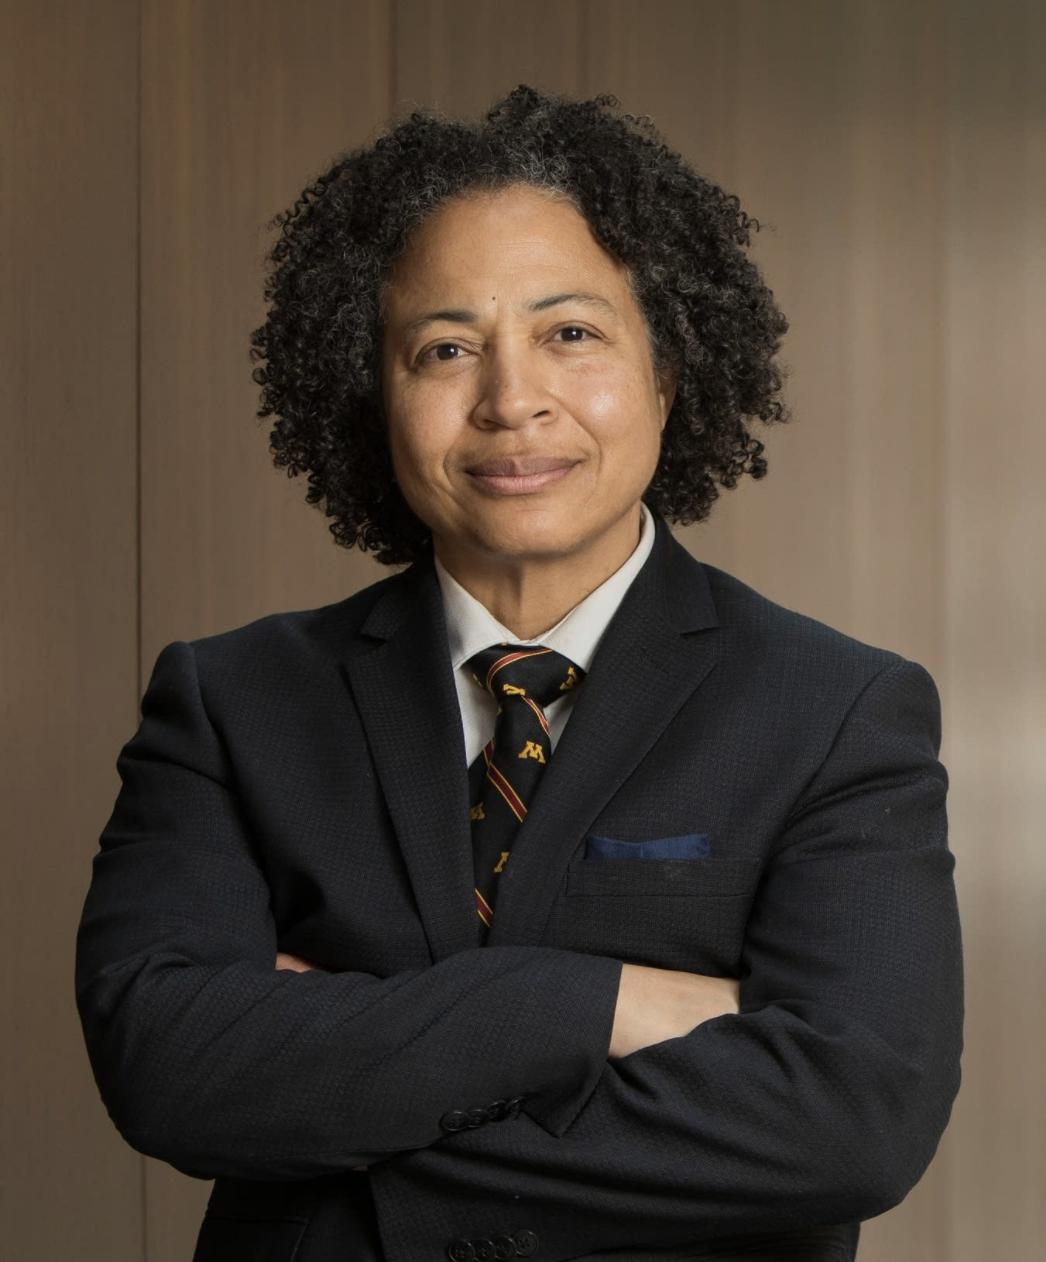 Dr. Renee Chrichlow